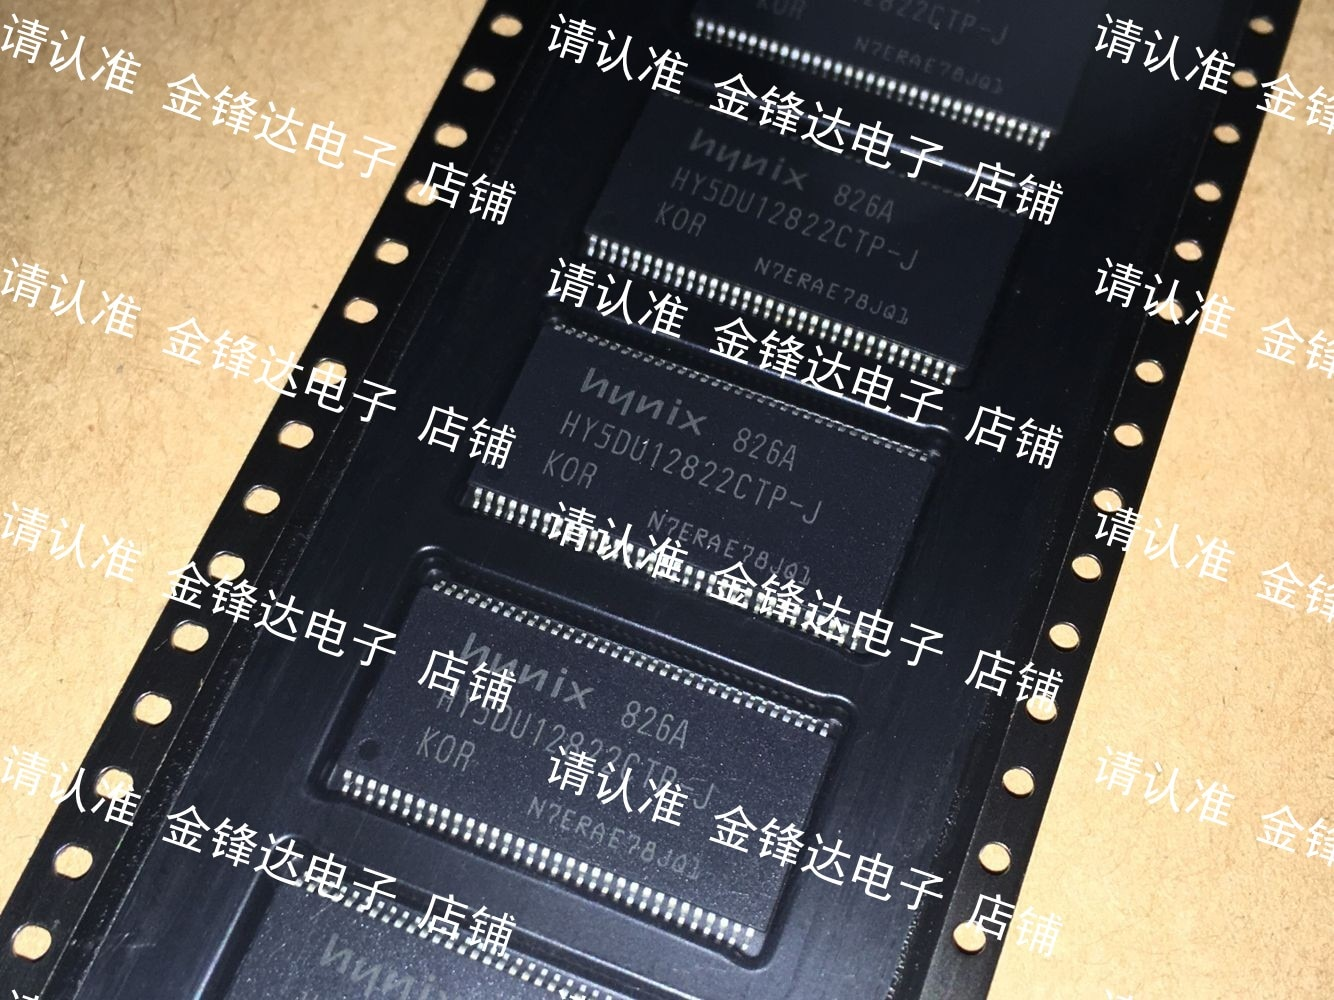 HY5DU12822DTP-D43 /CTP-D43 /DTP-J /CTP-J /BT-J / AT-H